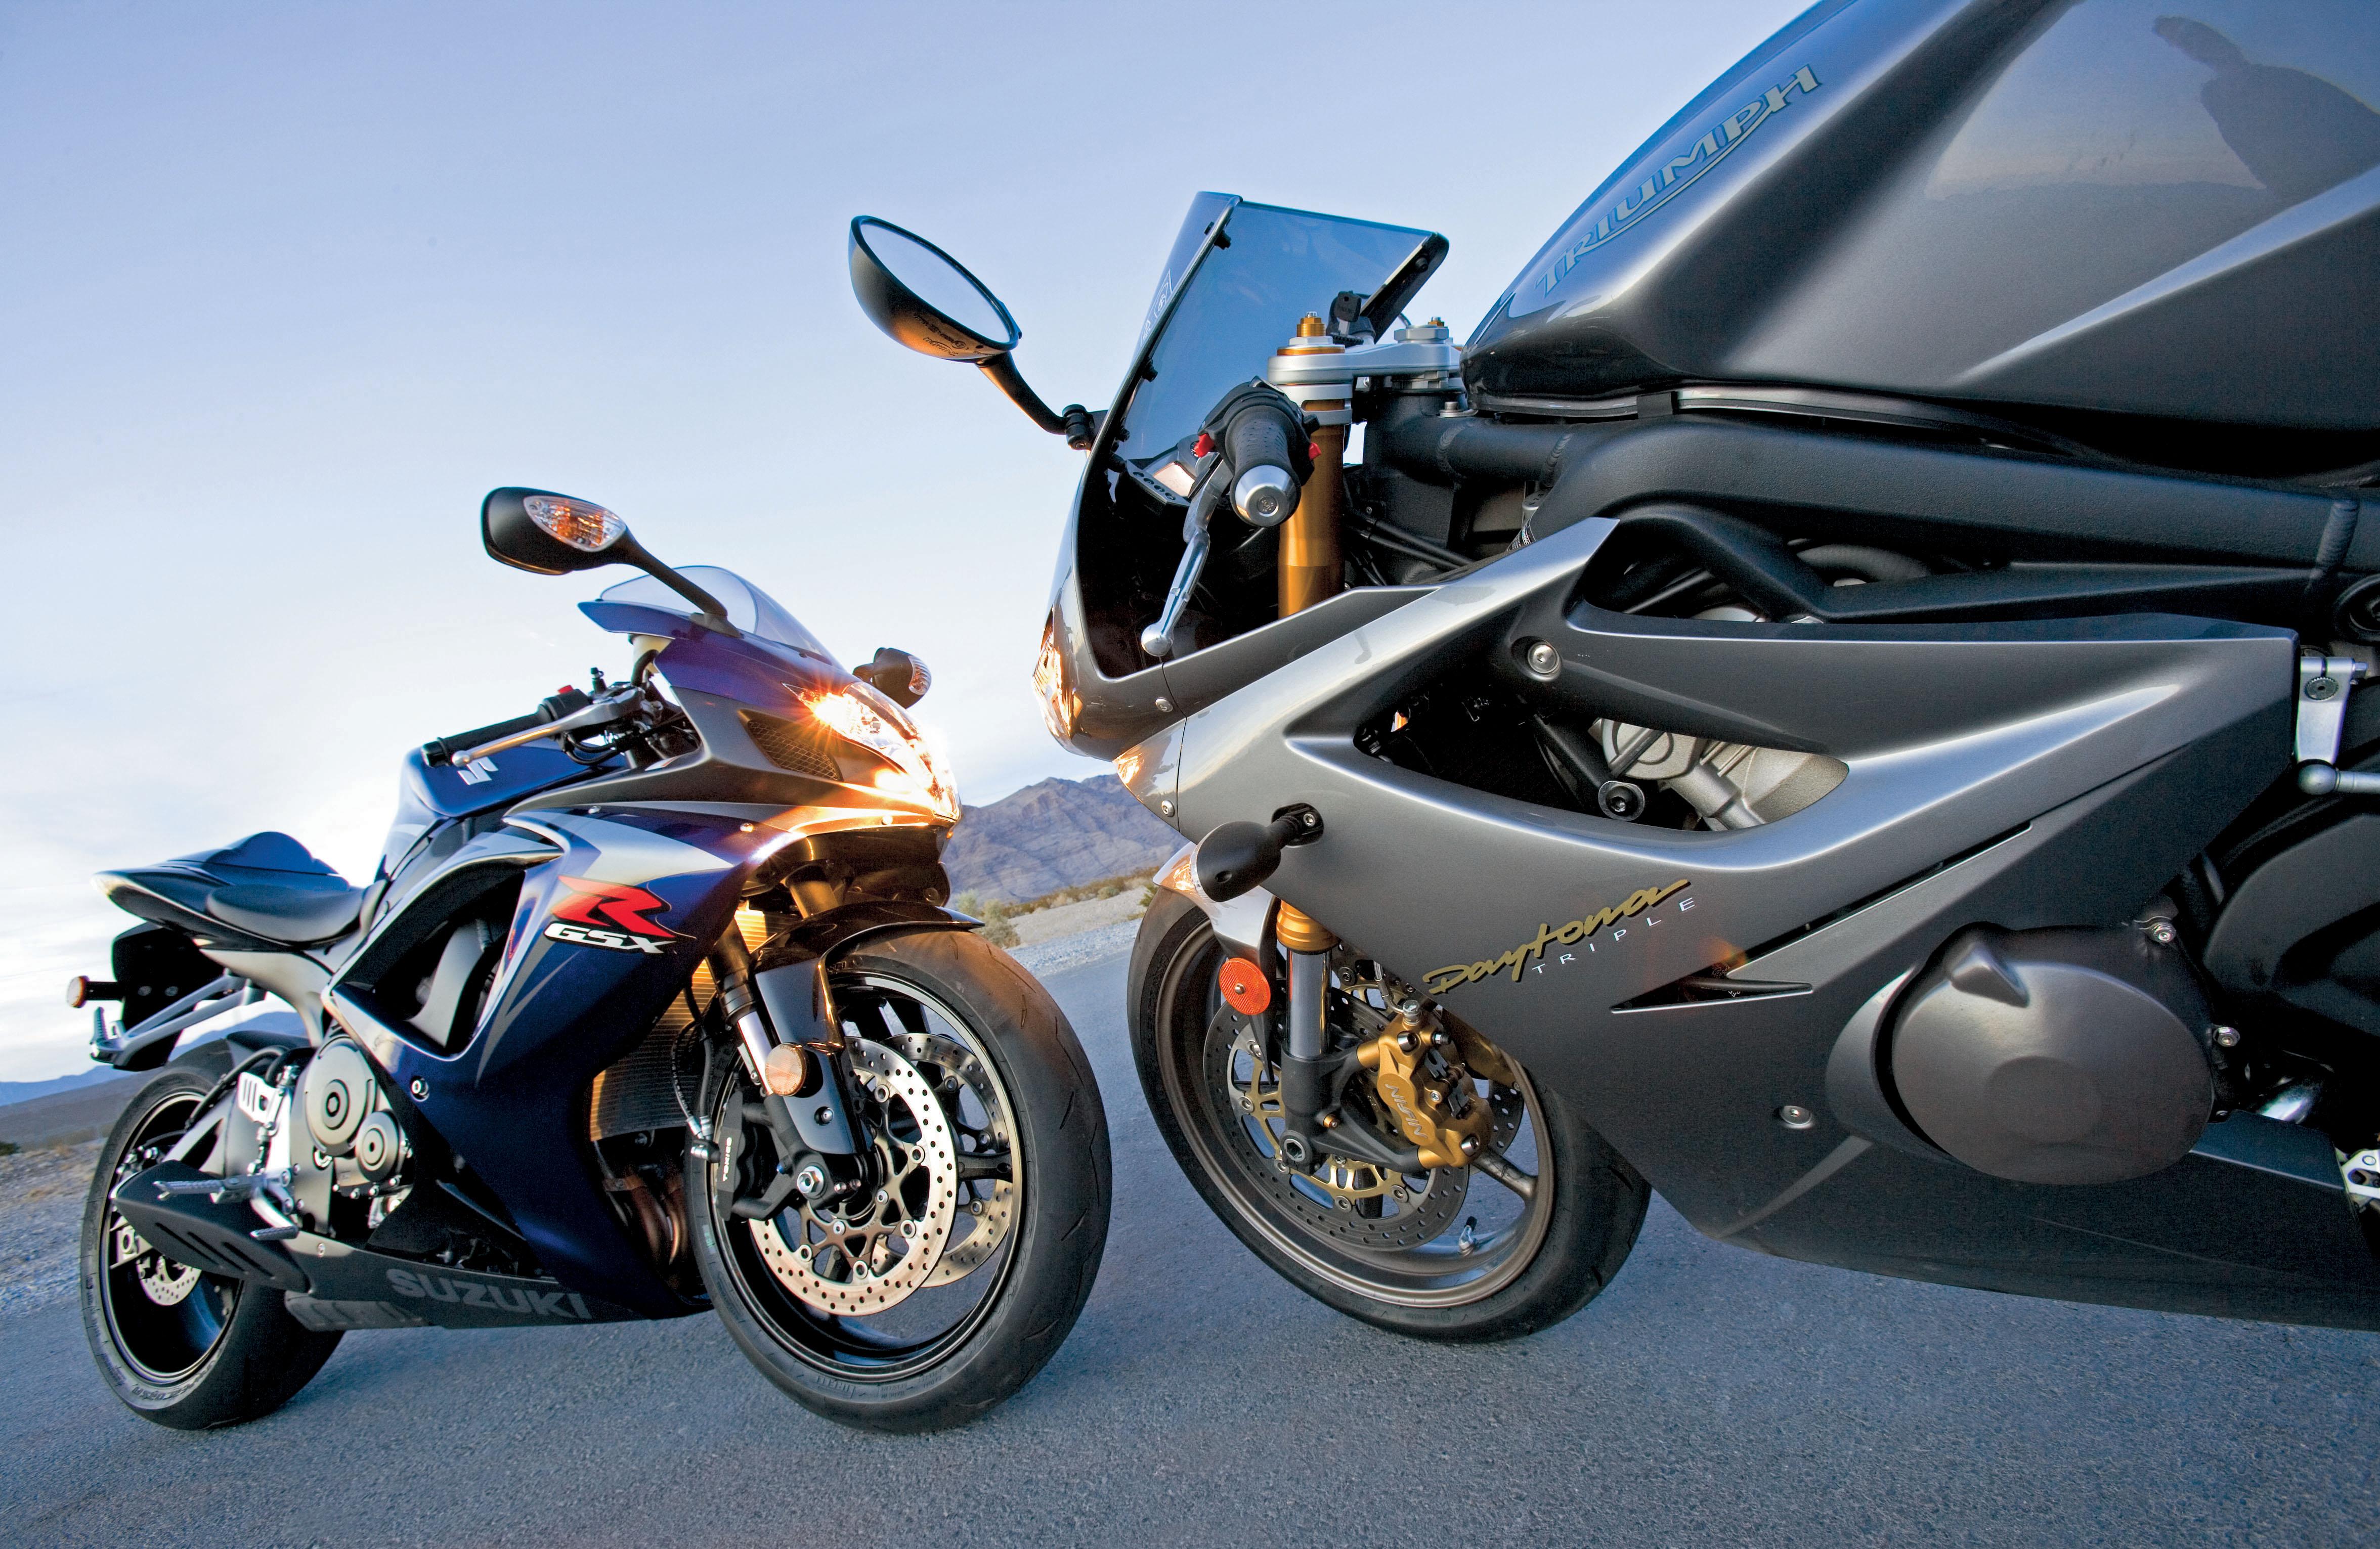 Suzuki GSX-R750 vs  Triumph Daytona 675 Motorcycle Review